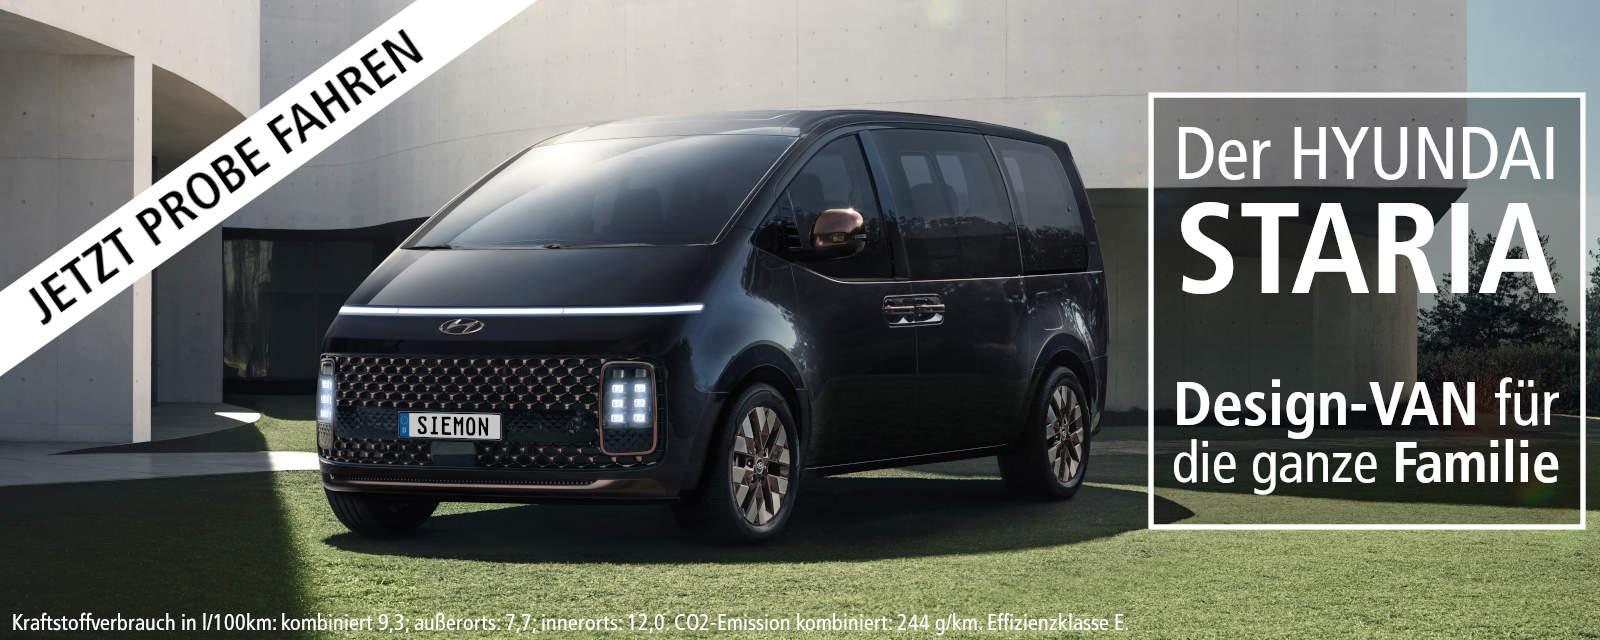 HYUNDAI STARIA - Design-Van - Leasing & Finanzierung